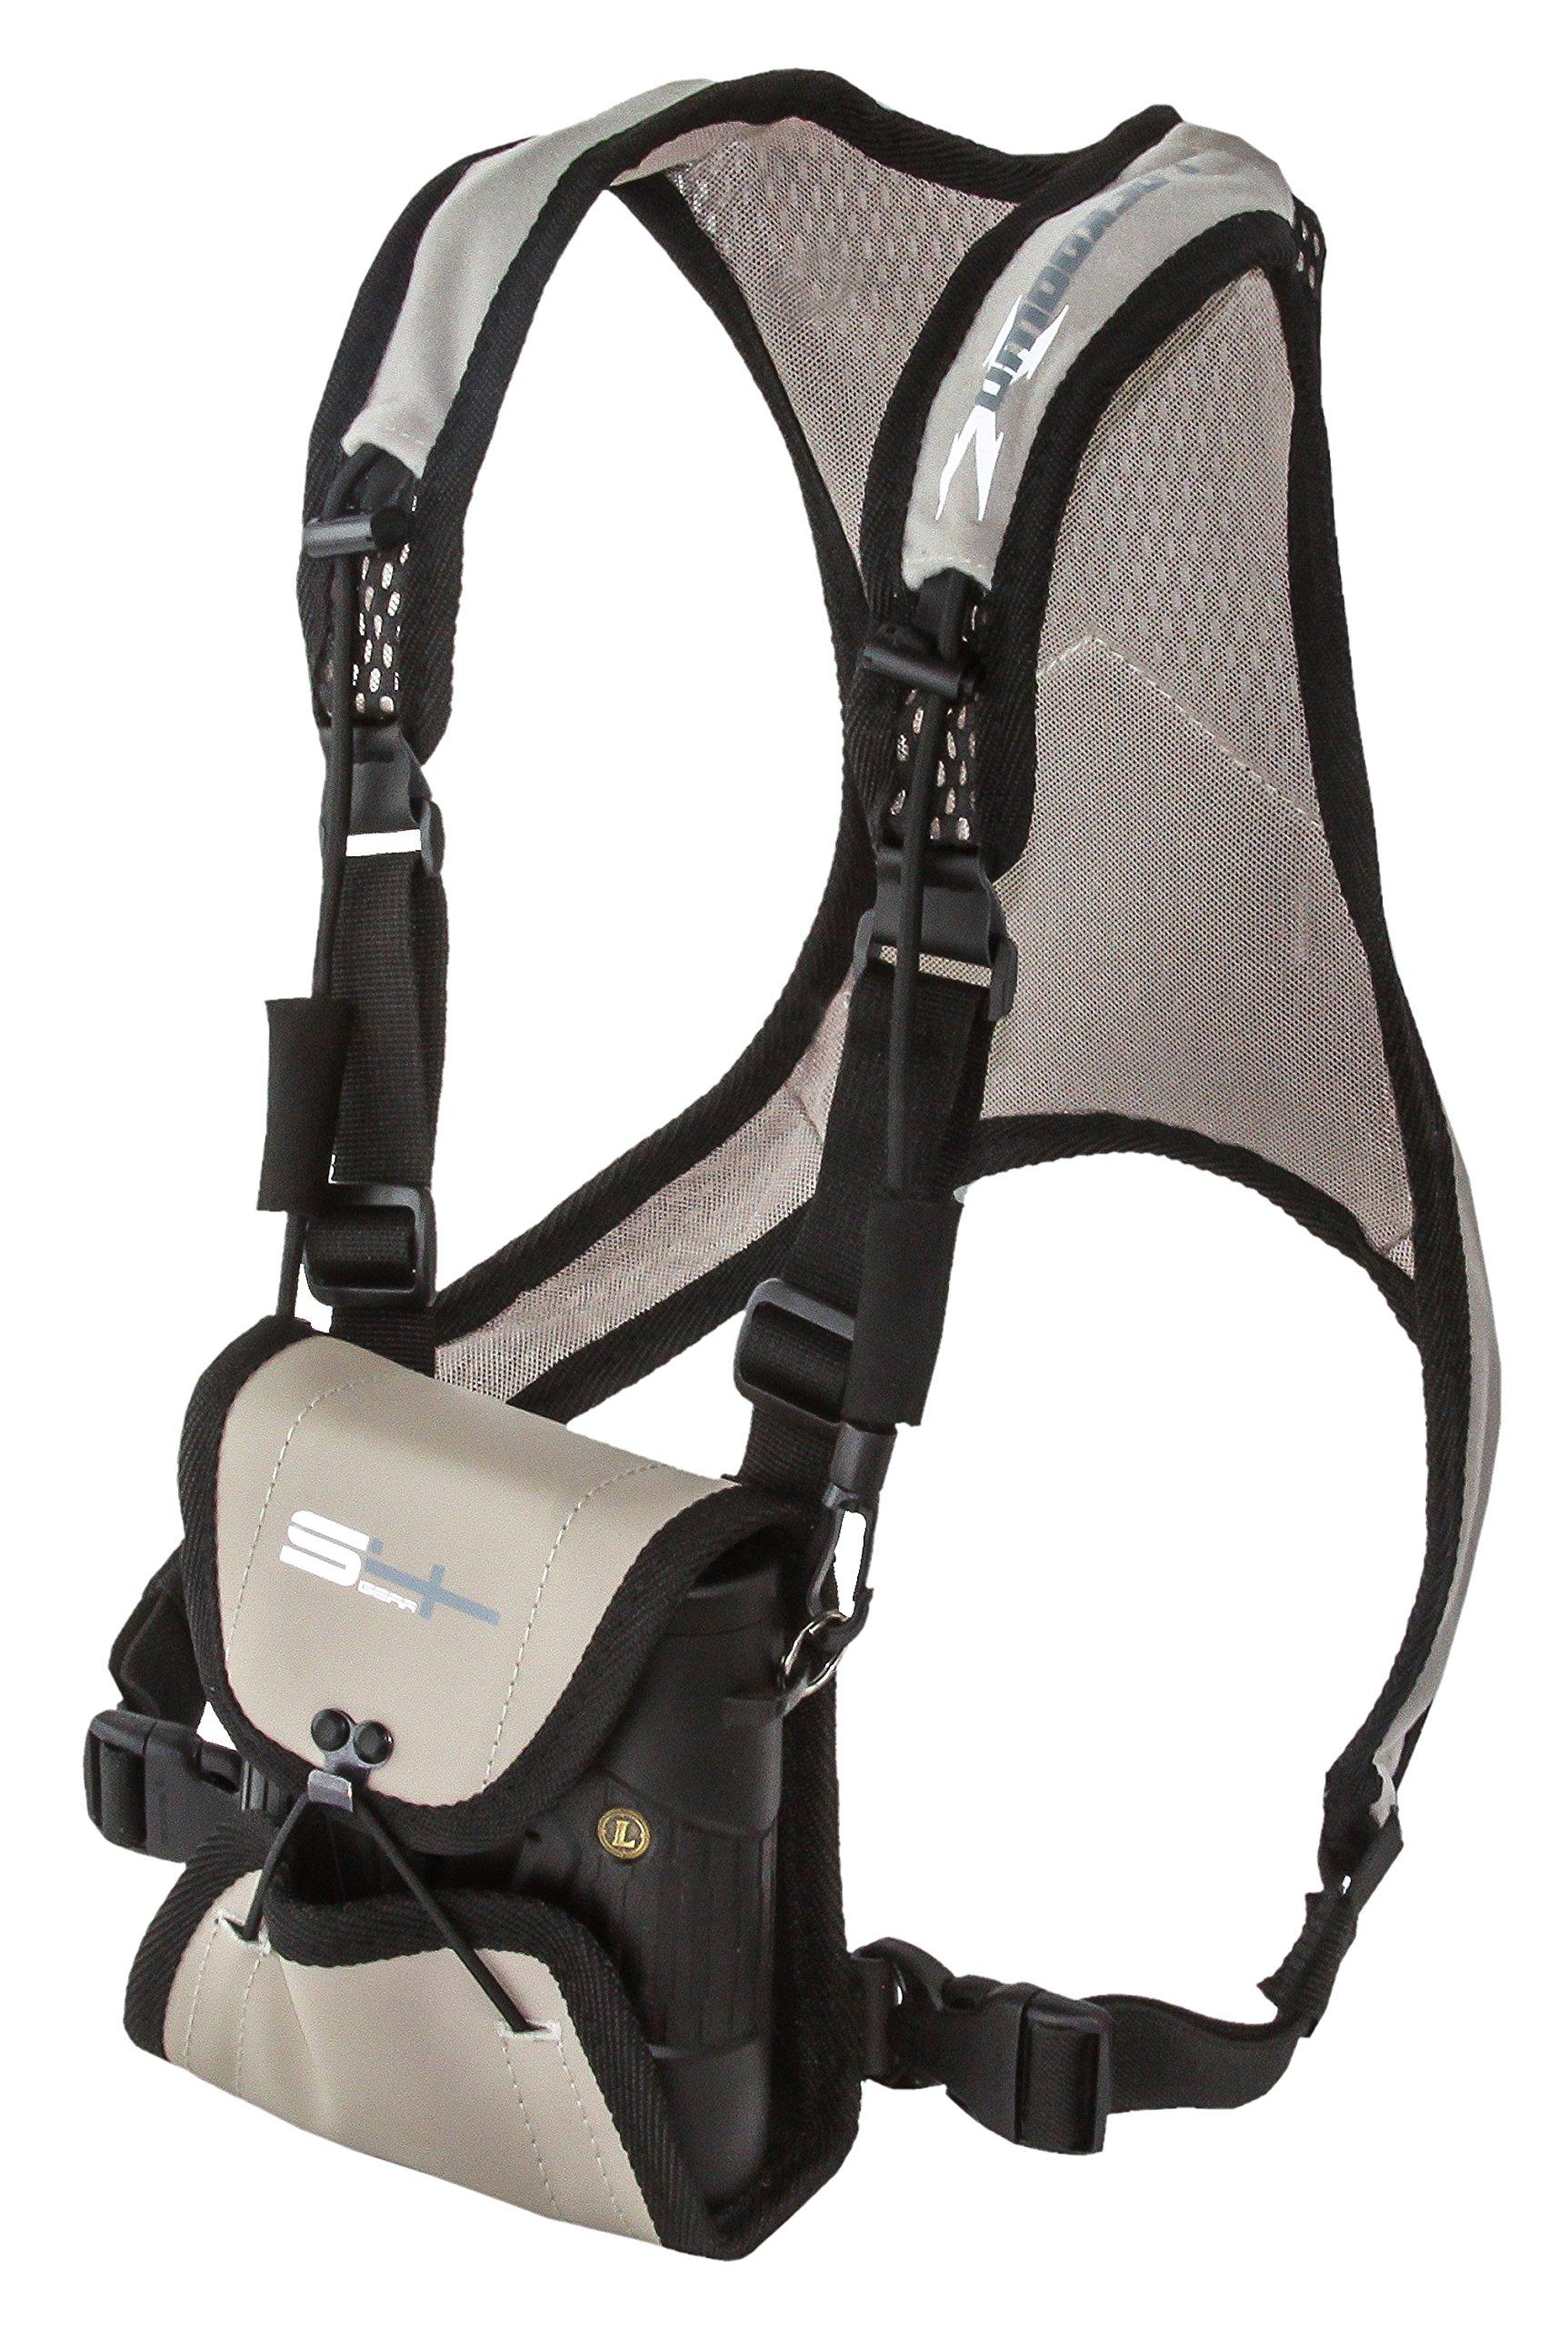 S4 Gear Lockdown X Hands Free Adjustable Binocular Harness for use with Leupold, Nikon, Swarovski, Bushnell, Canon Etc, Tan